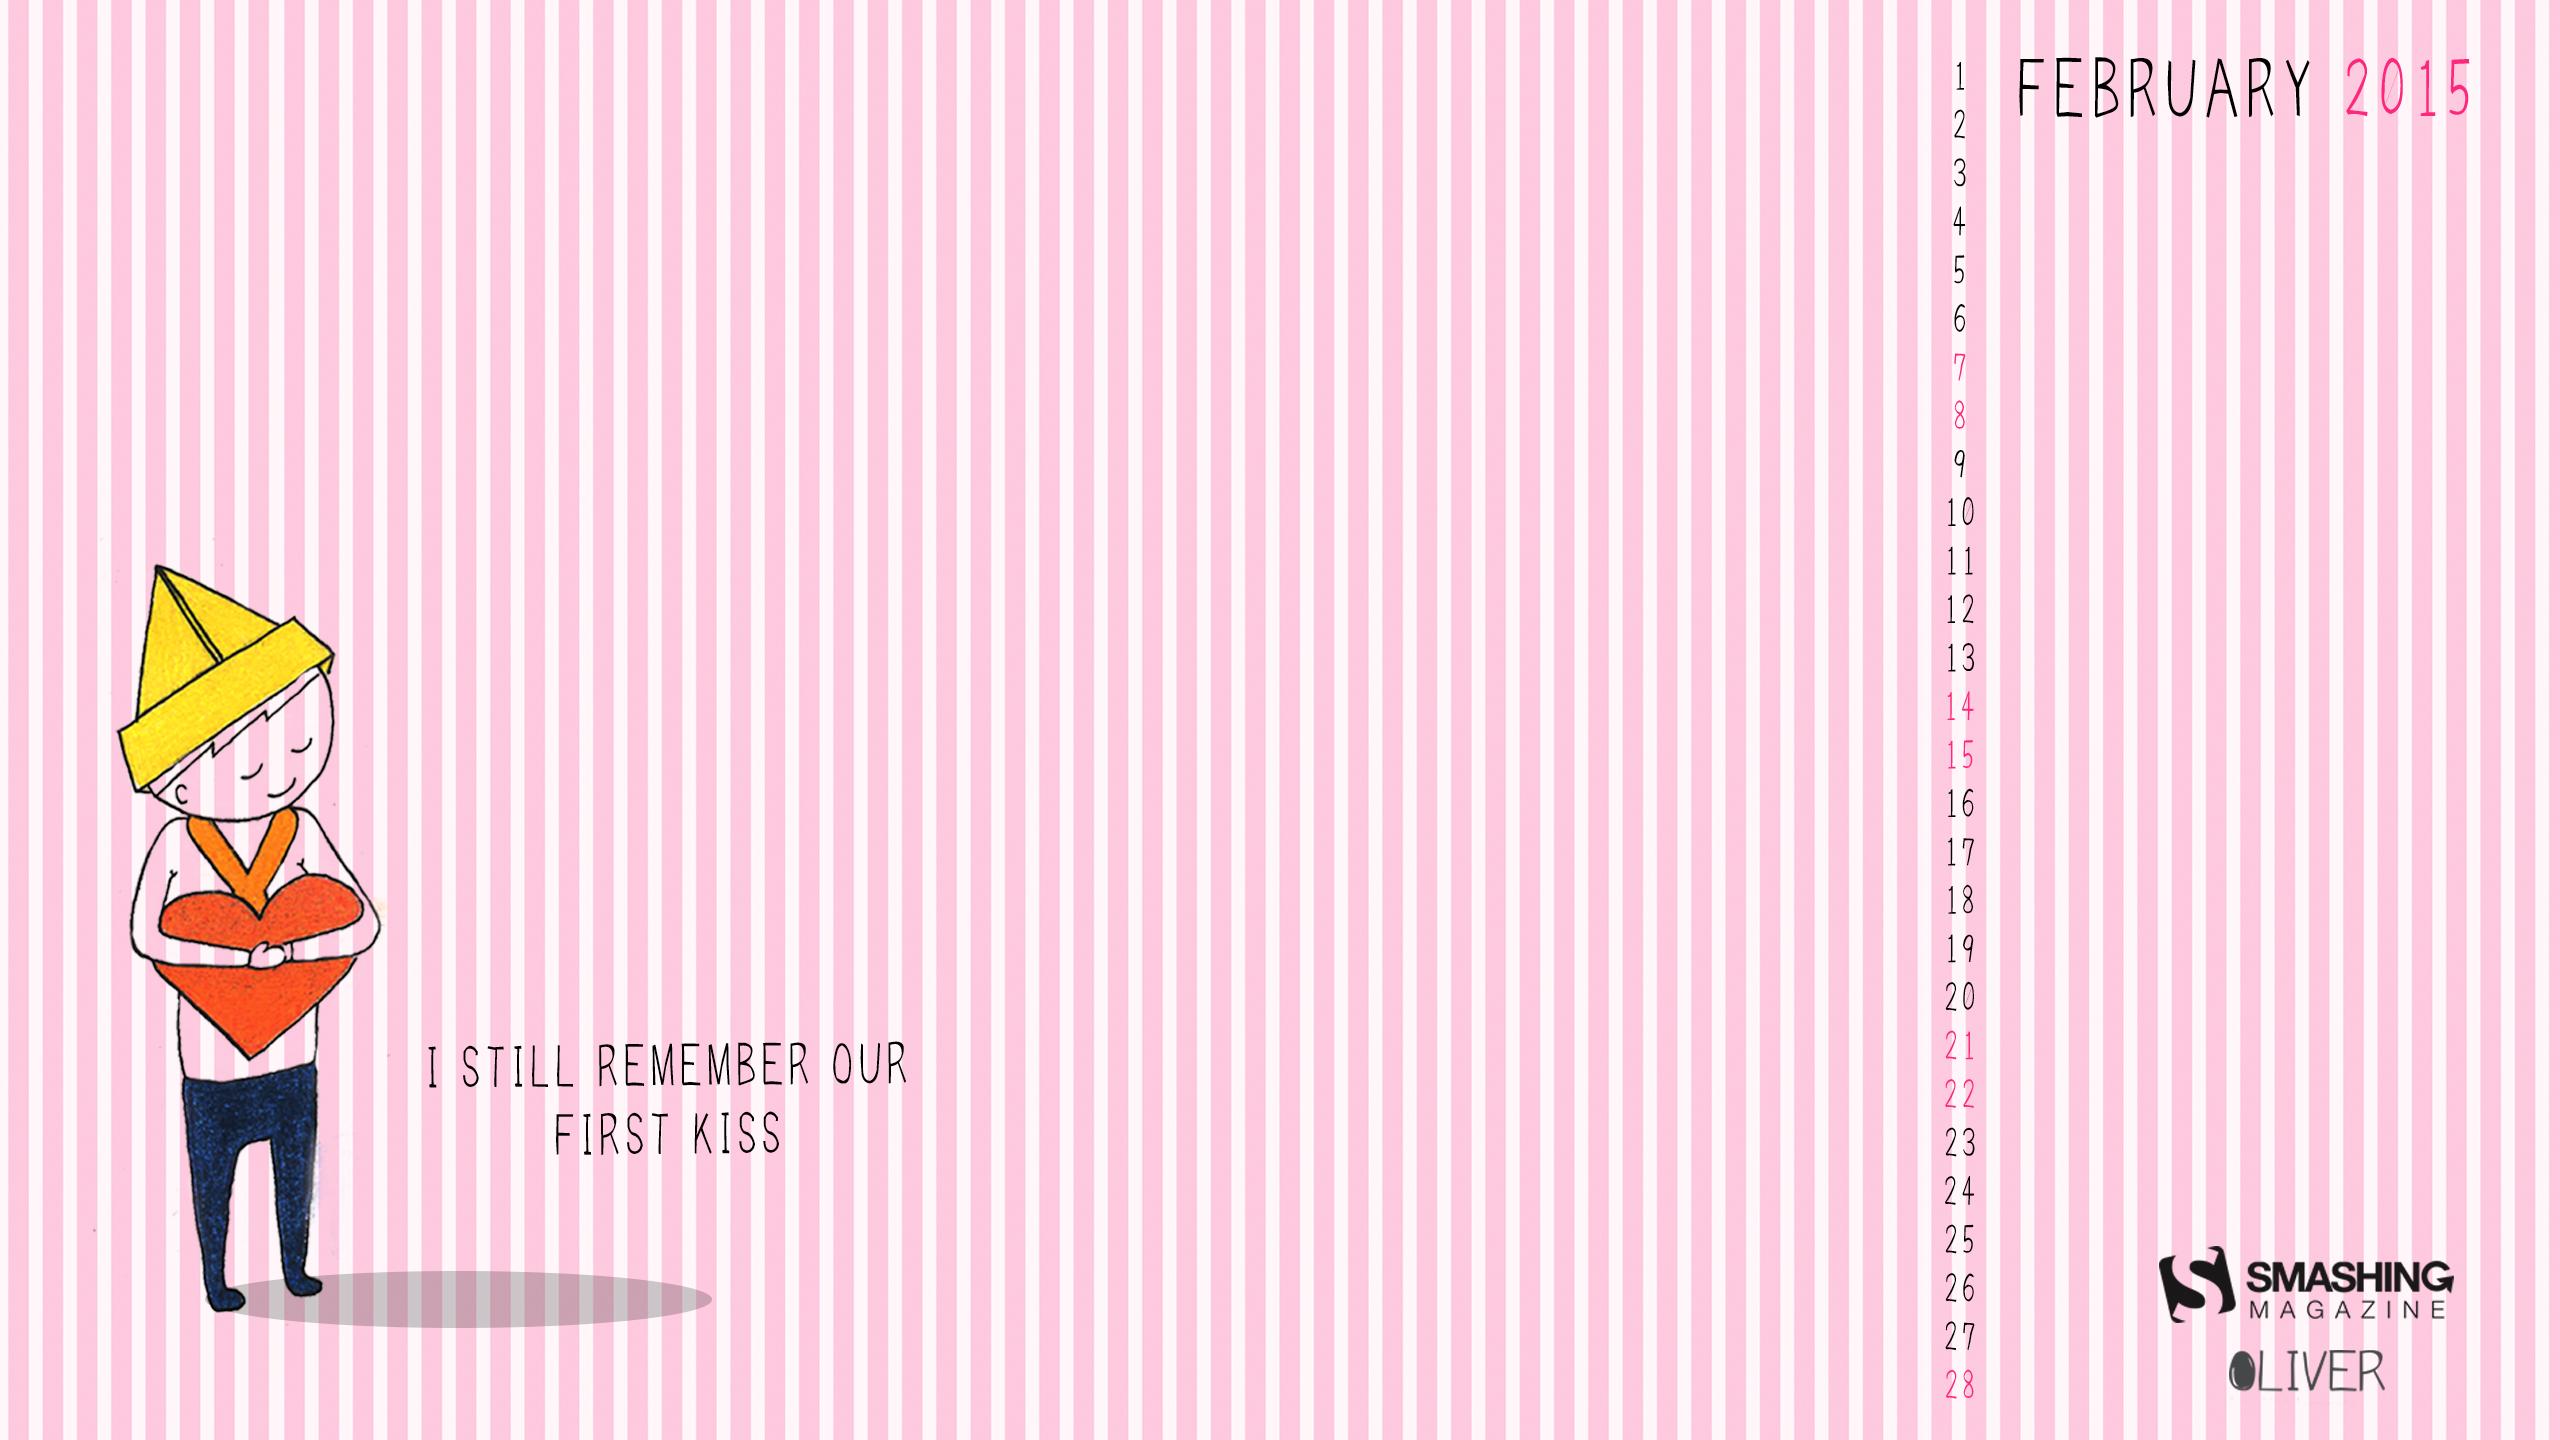 Desktop Wallpaper Calendars February 2015   Print2Web 2560x1440